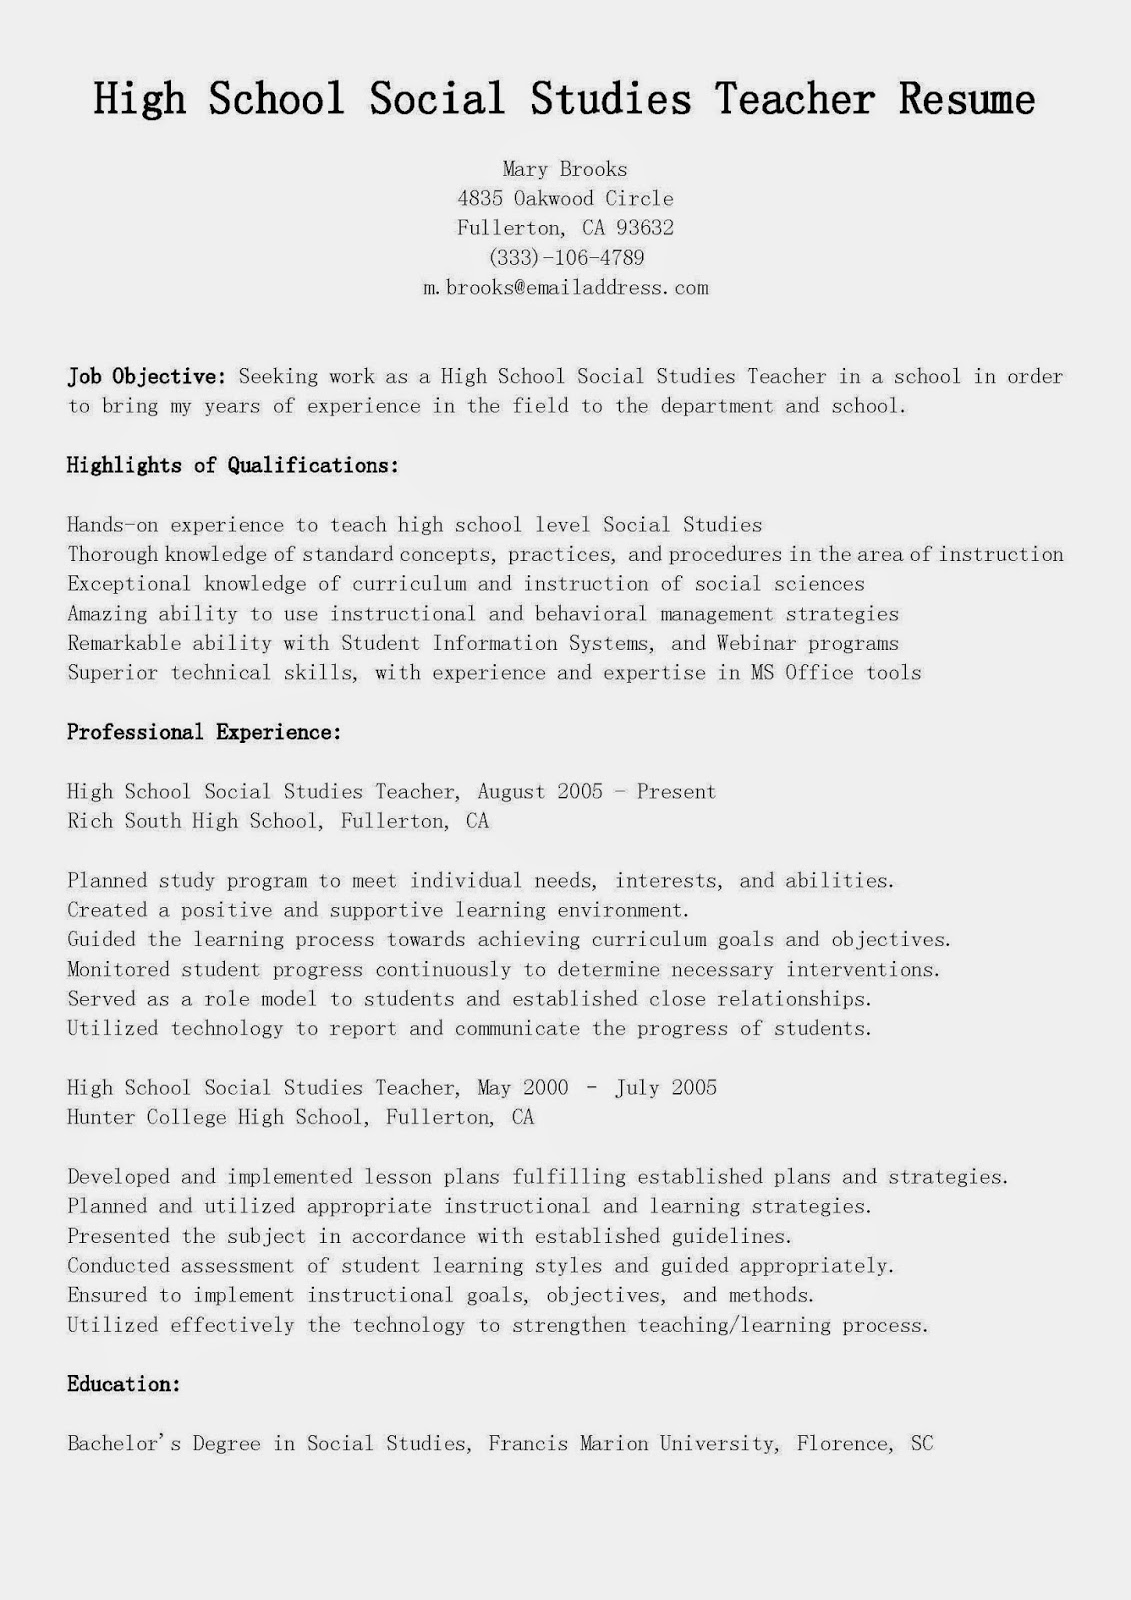 resume samples  high school social studies teacher resume